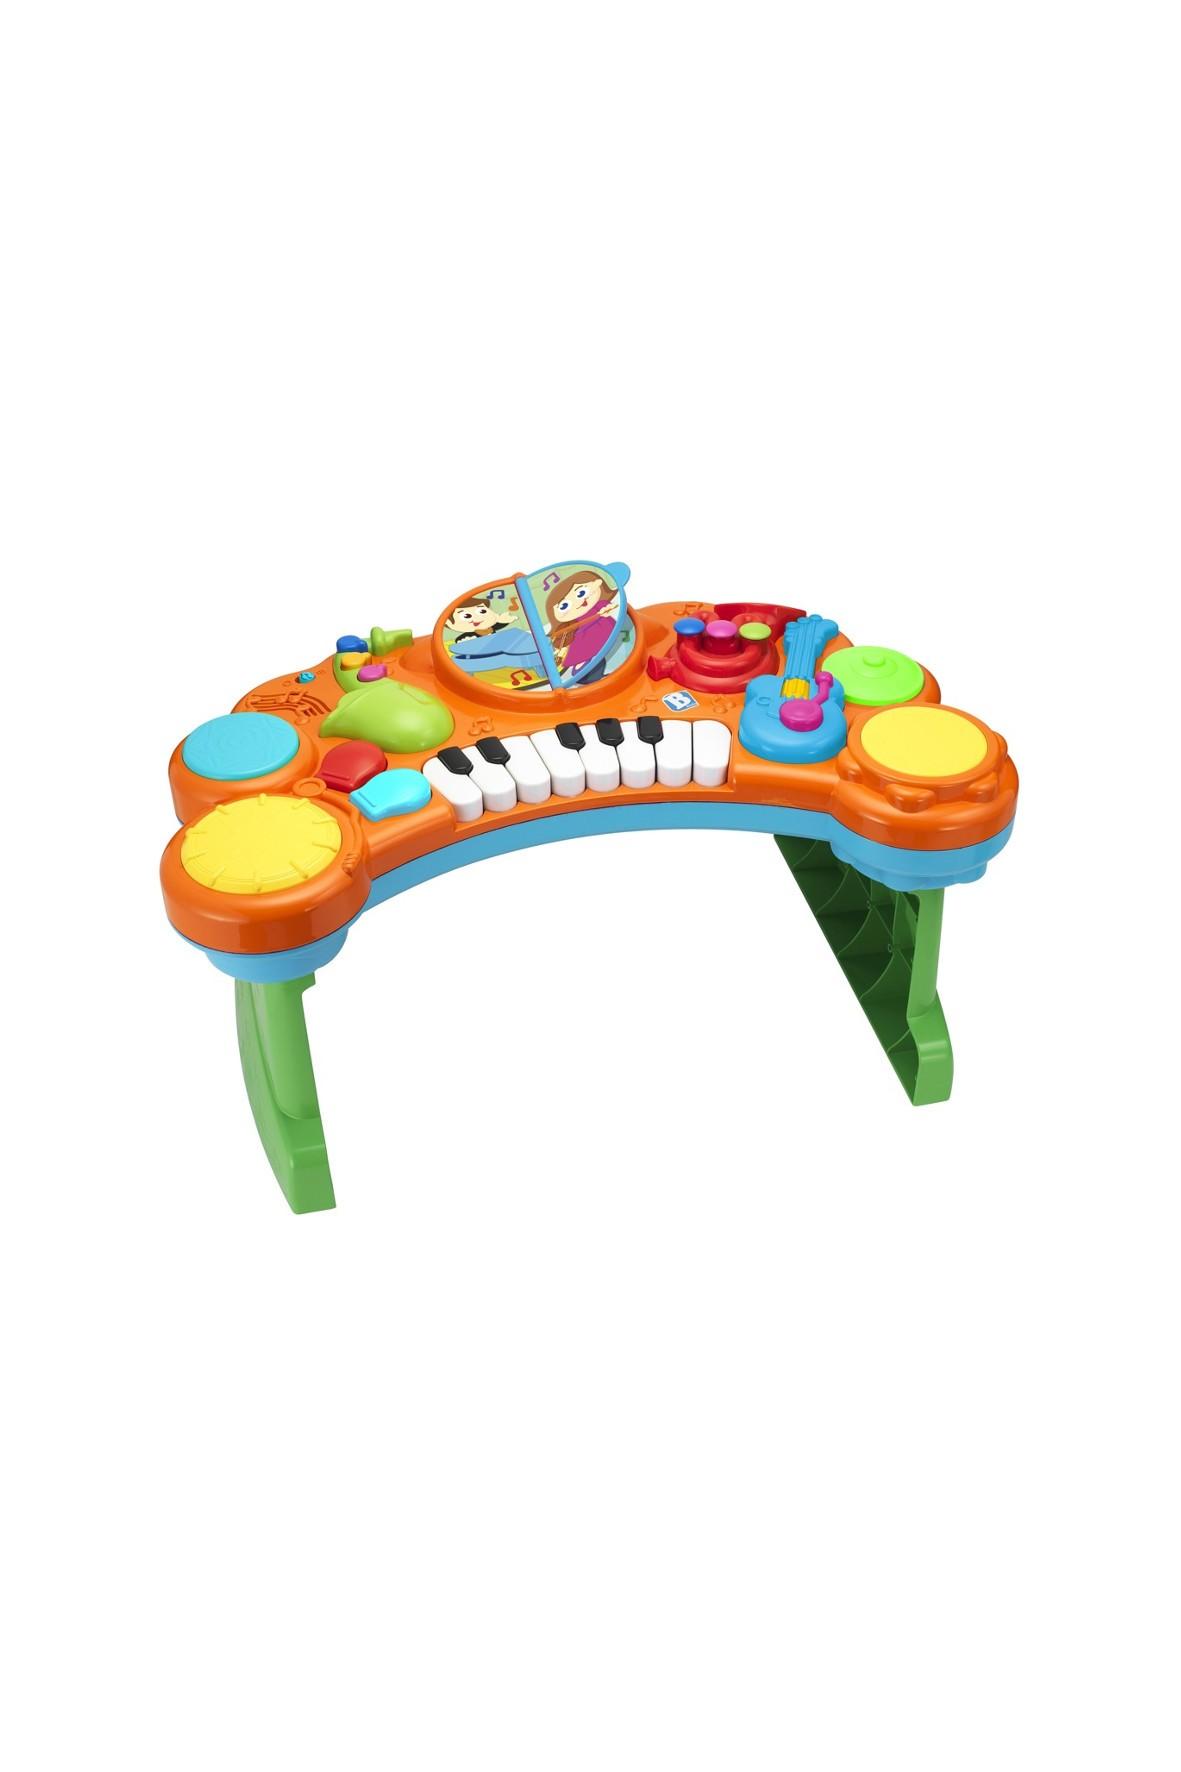 Keyboard dla malucha 10w1 B-kids